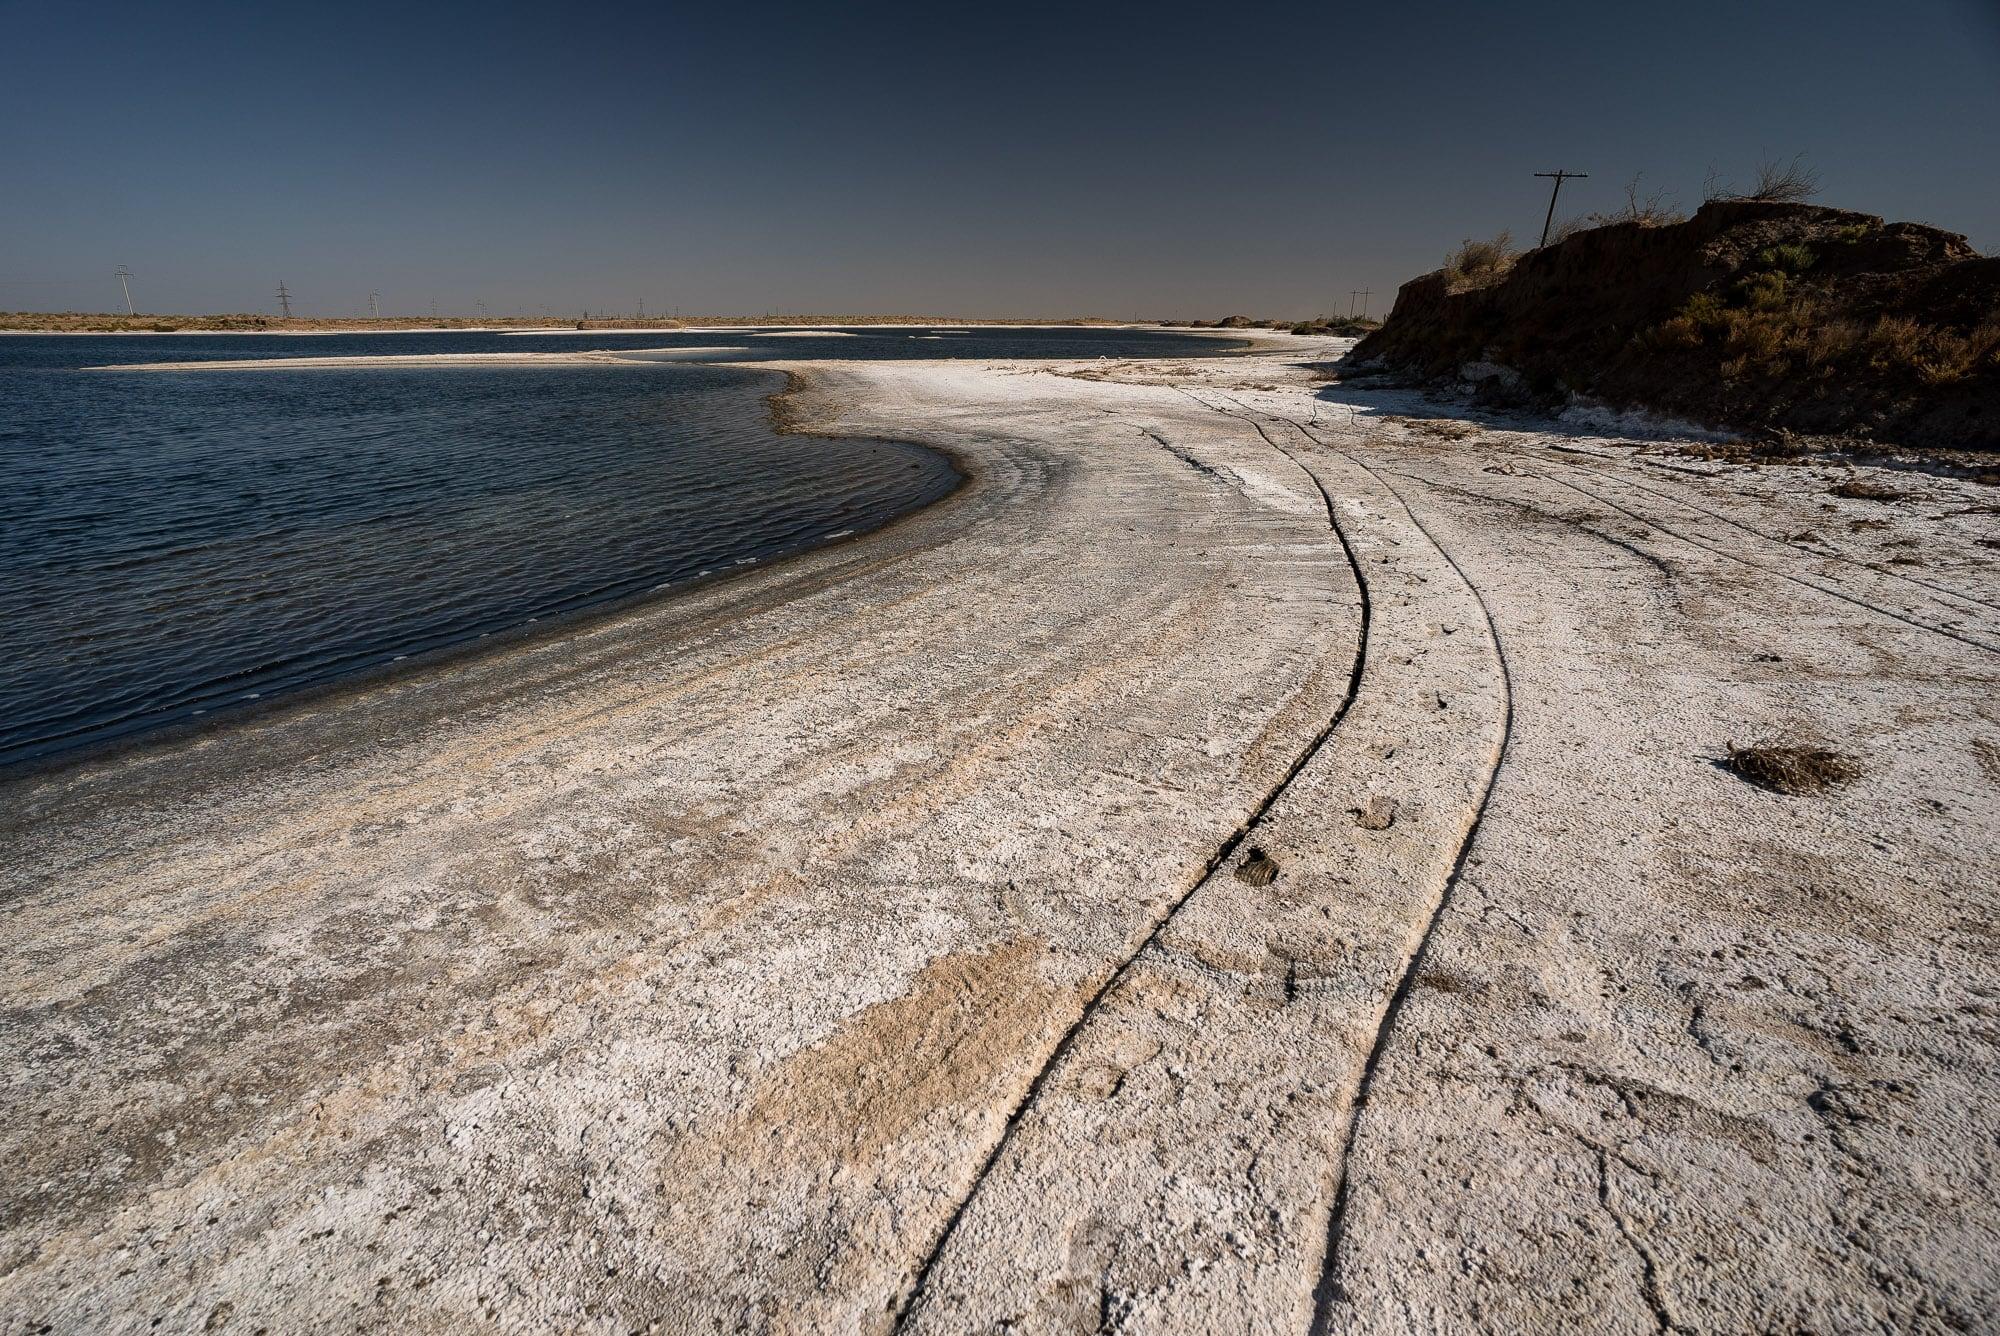 Caboose tracks next to the salt lake